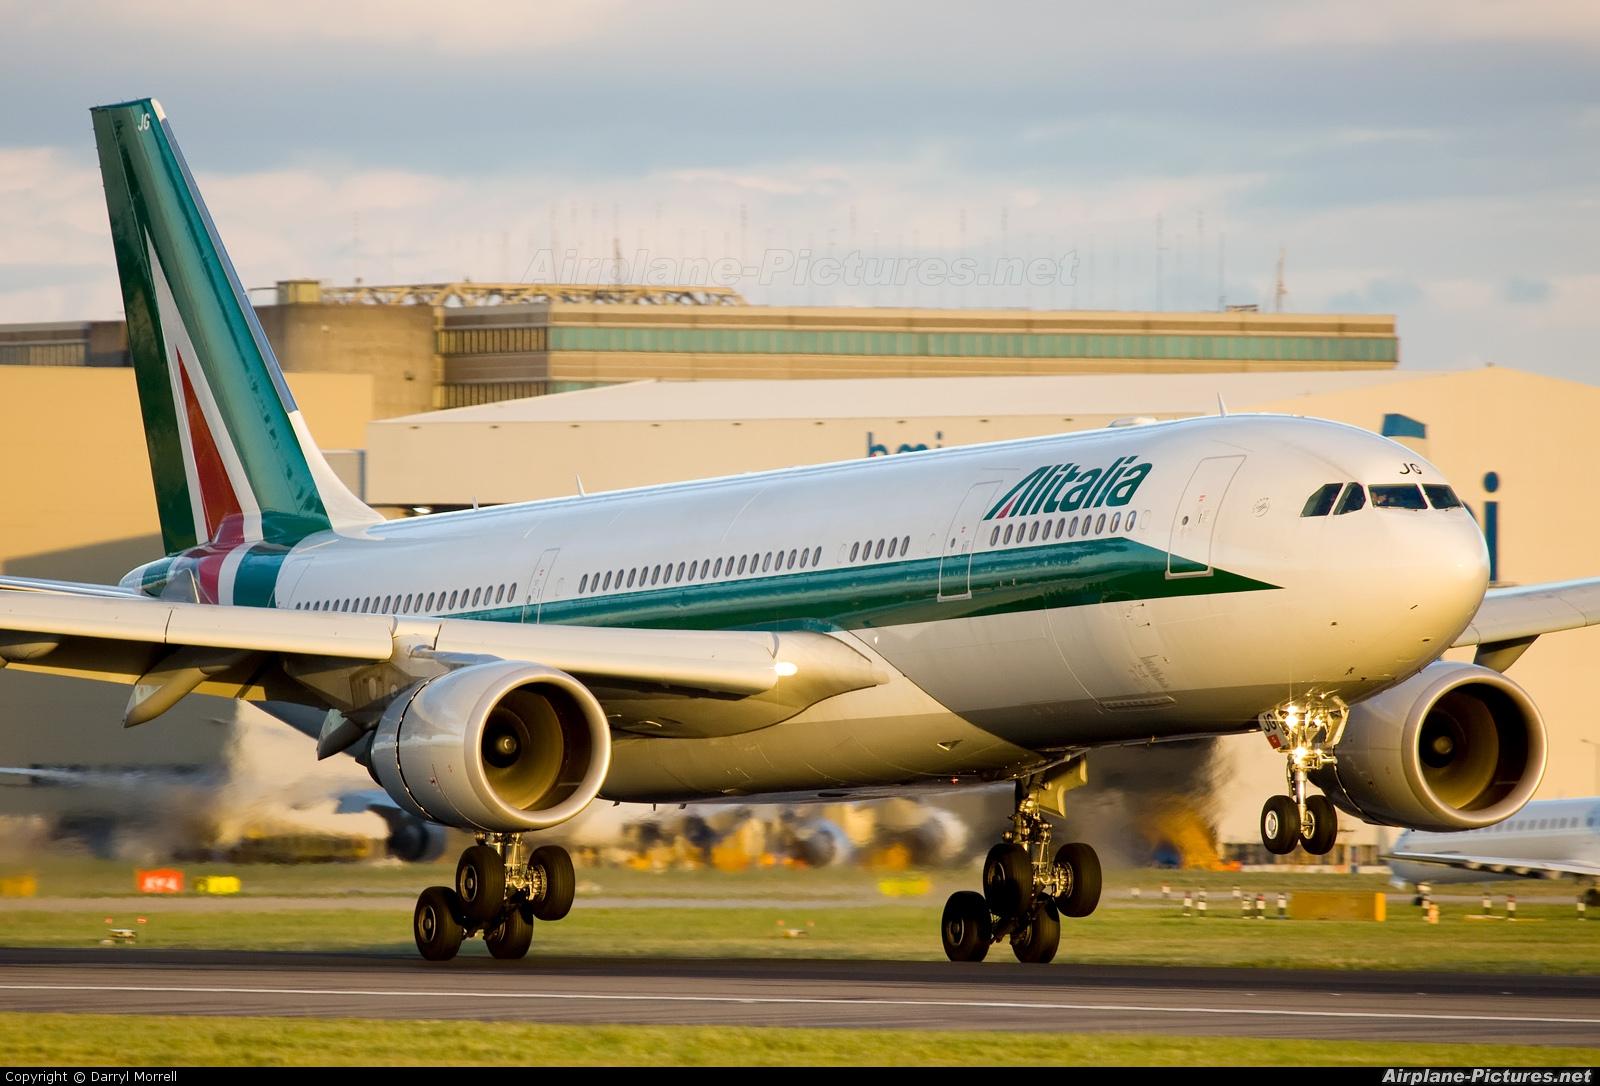 Jet Privato Alitalia : Ei ejg alitalia airbus a at london heathrow